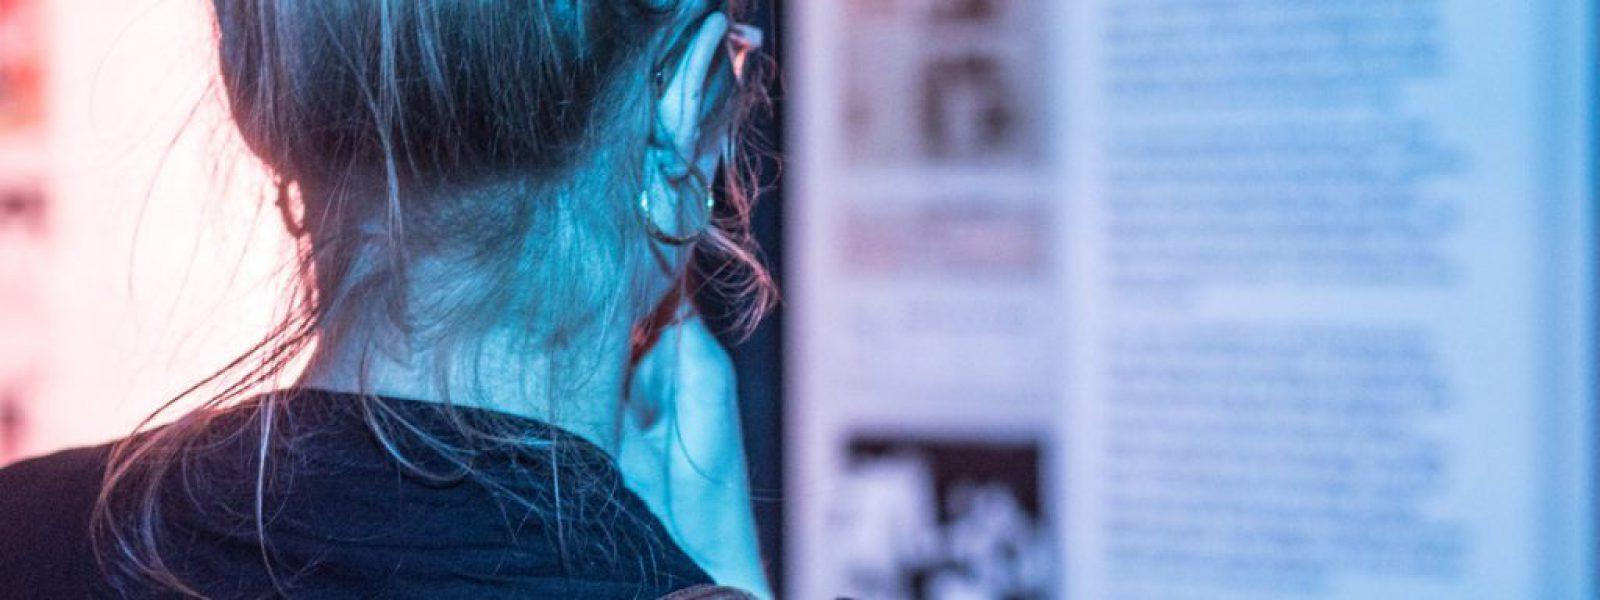 LNDM 2019 FCSPMuseum (Sabrina A Nagel) - 21